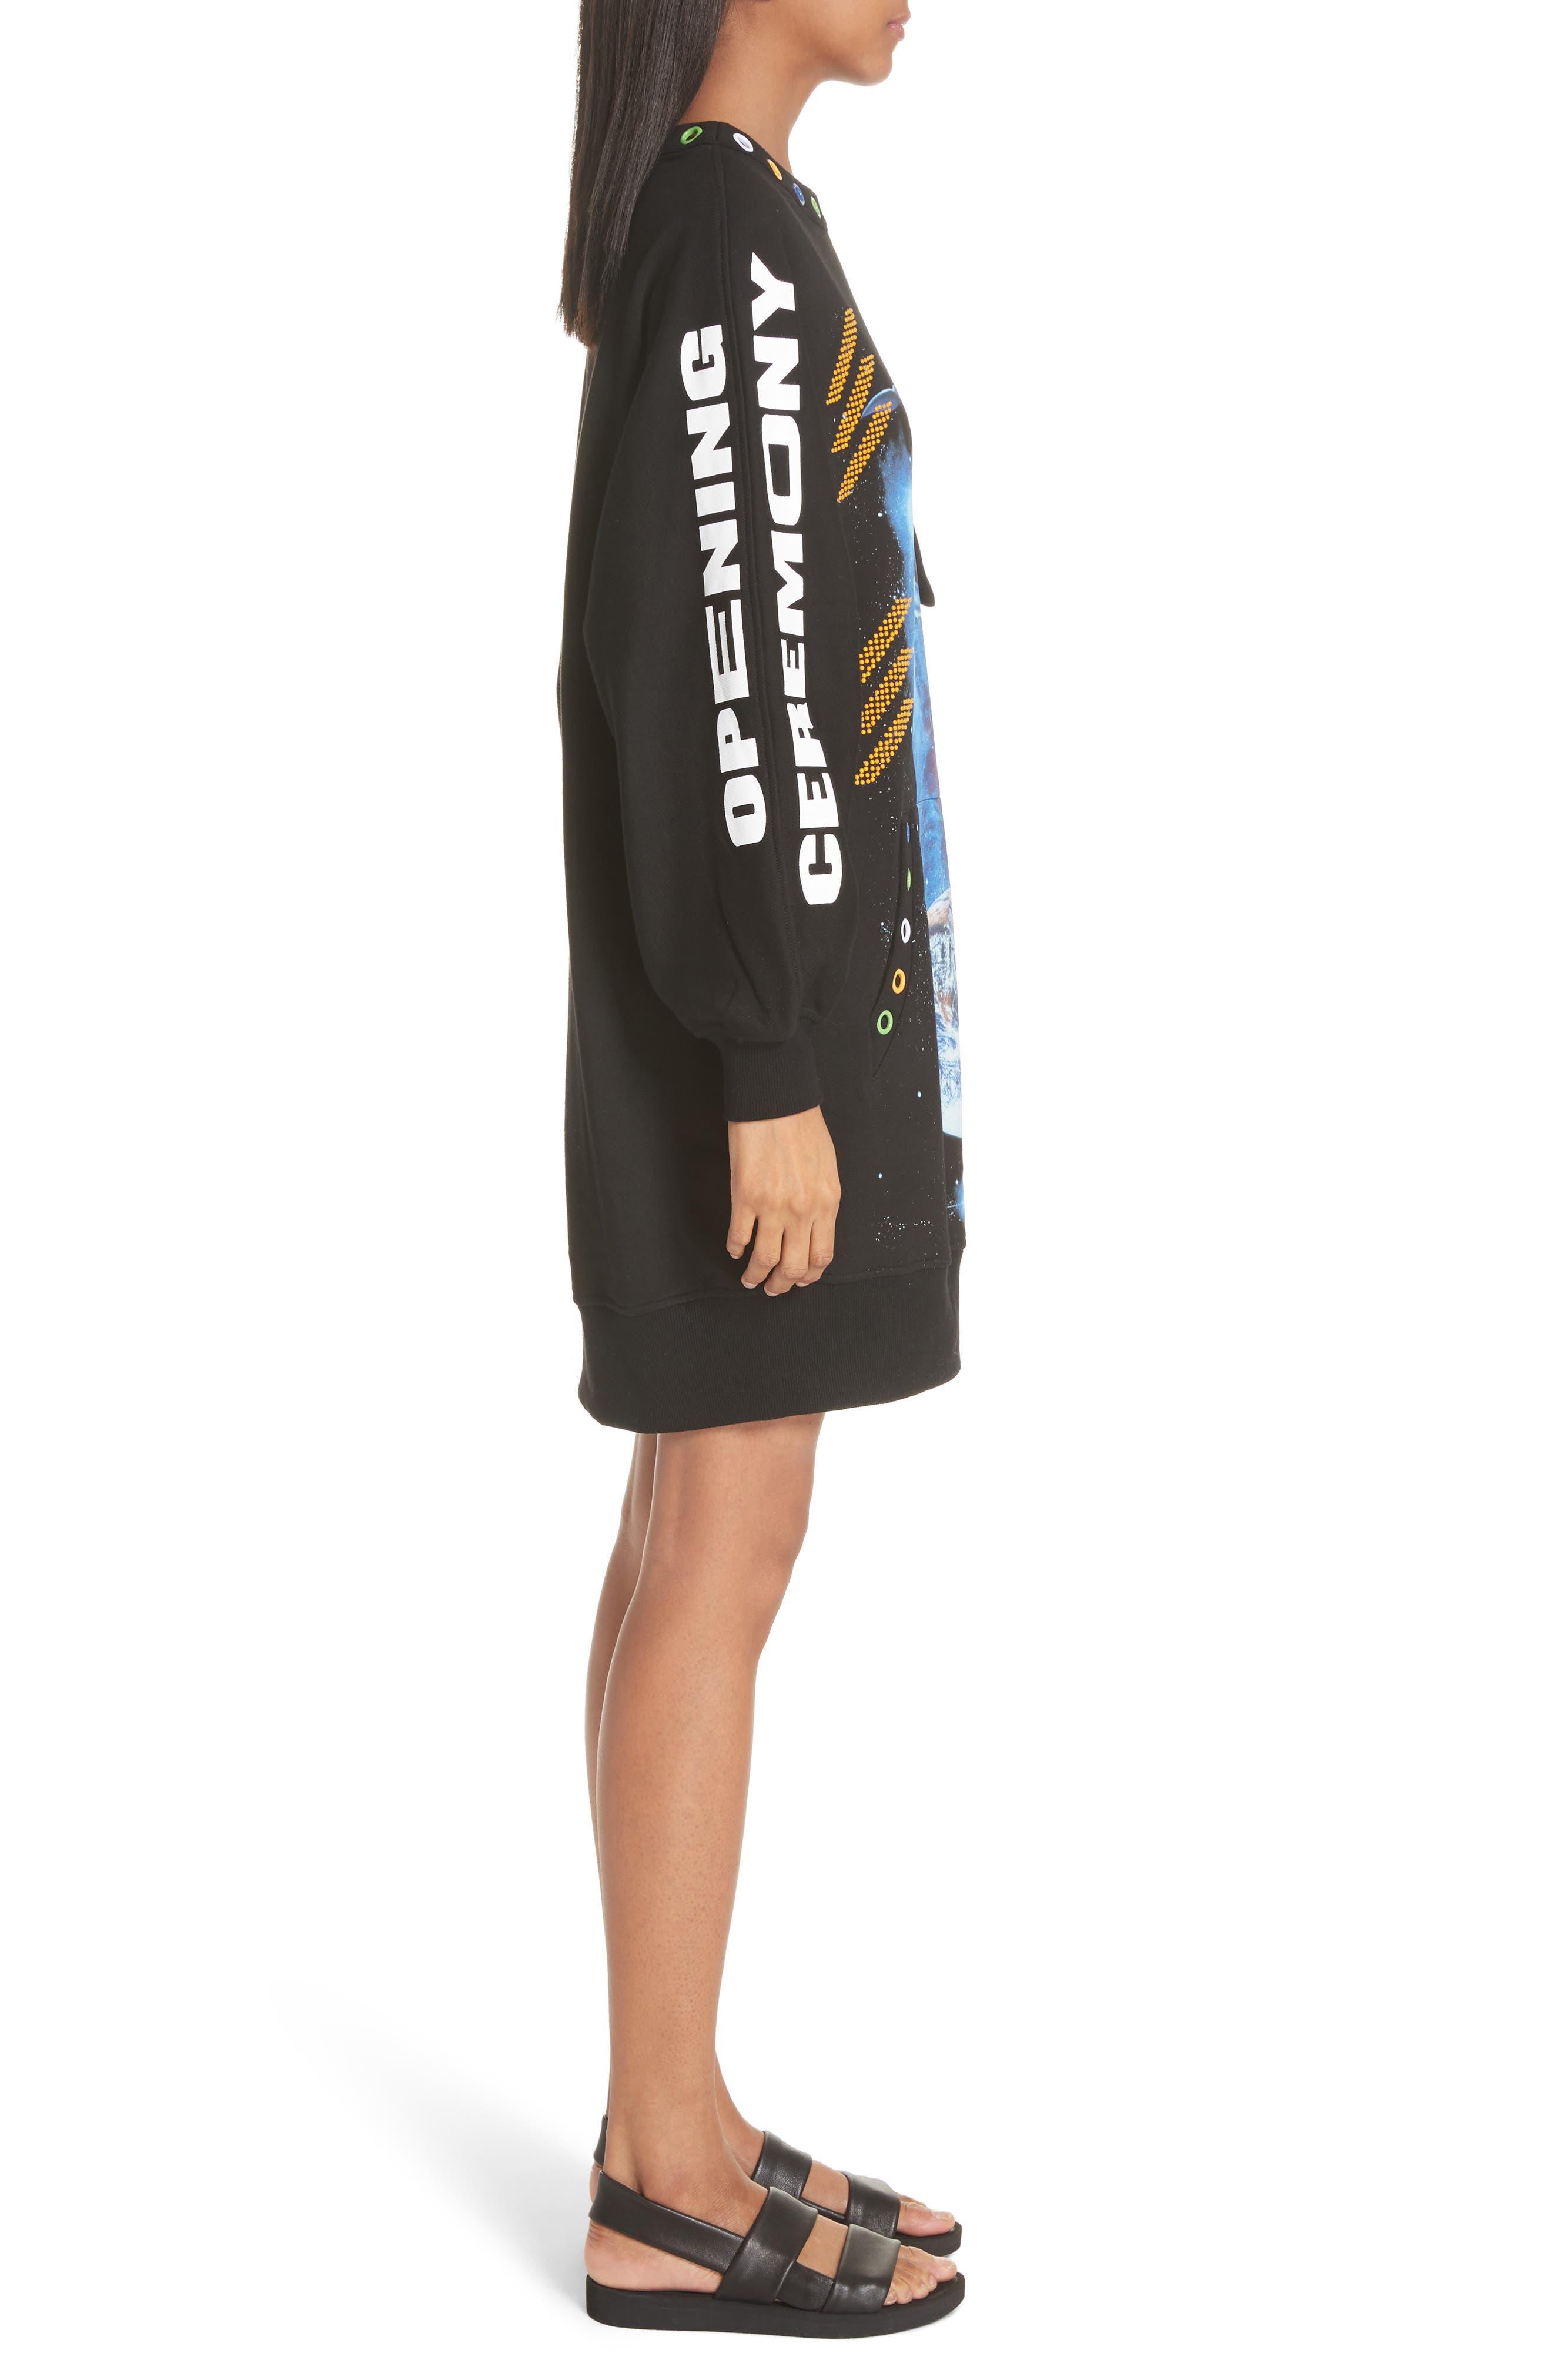 Christian Riese Lassen Sweatshirt Dress,                             Alternate thumbnail 3, color,                             001